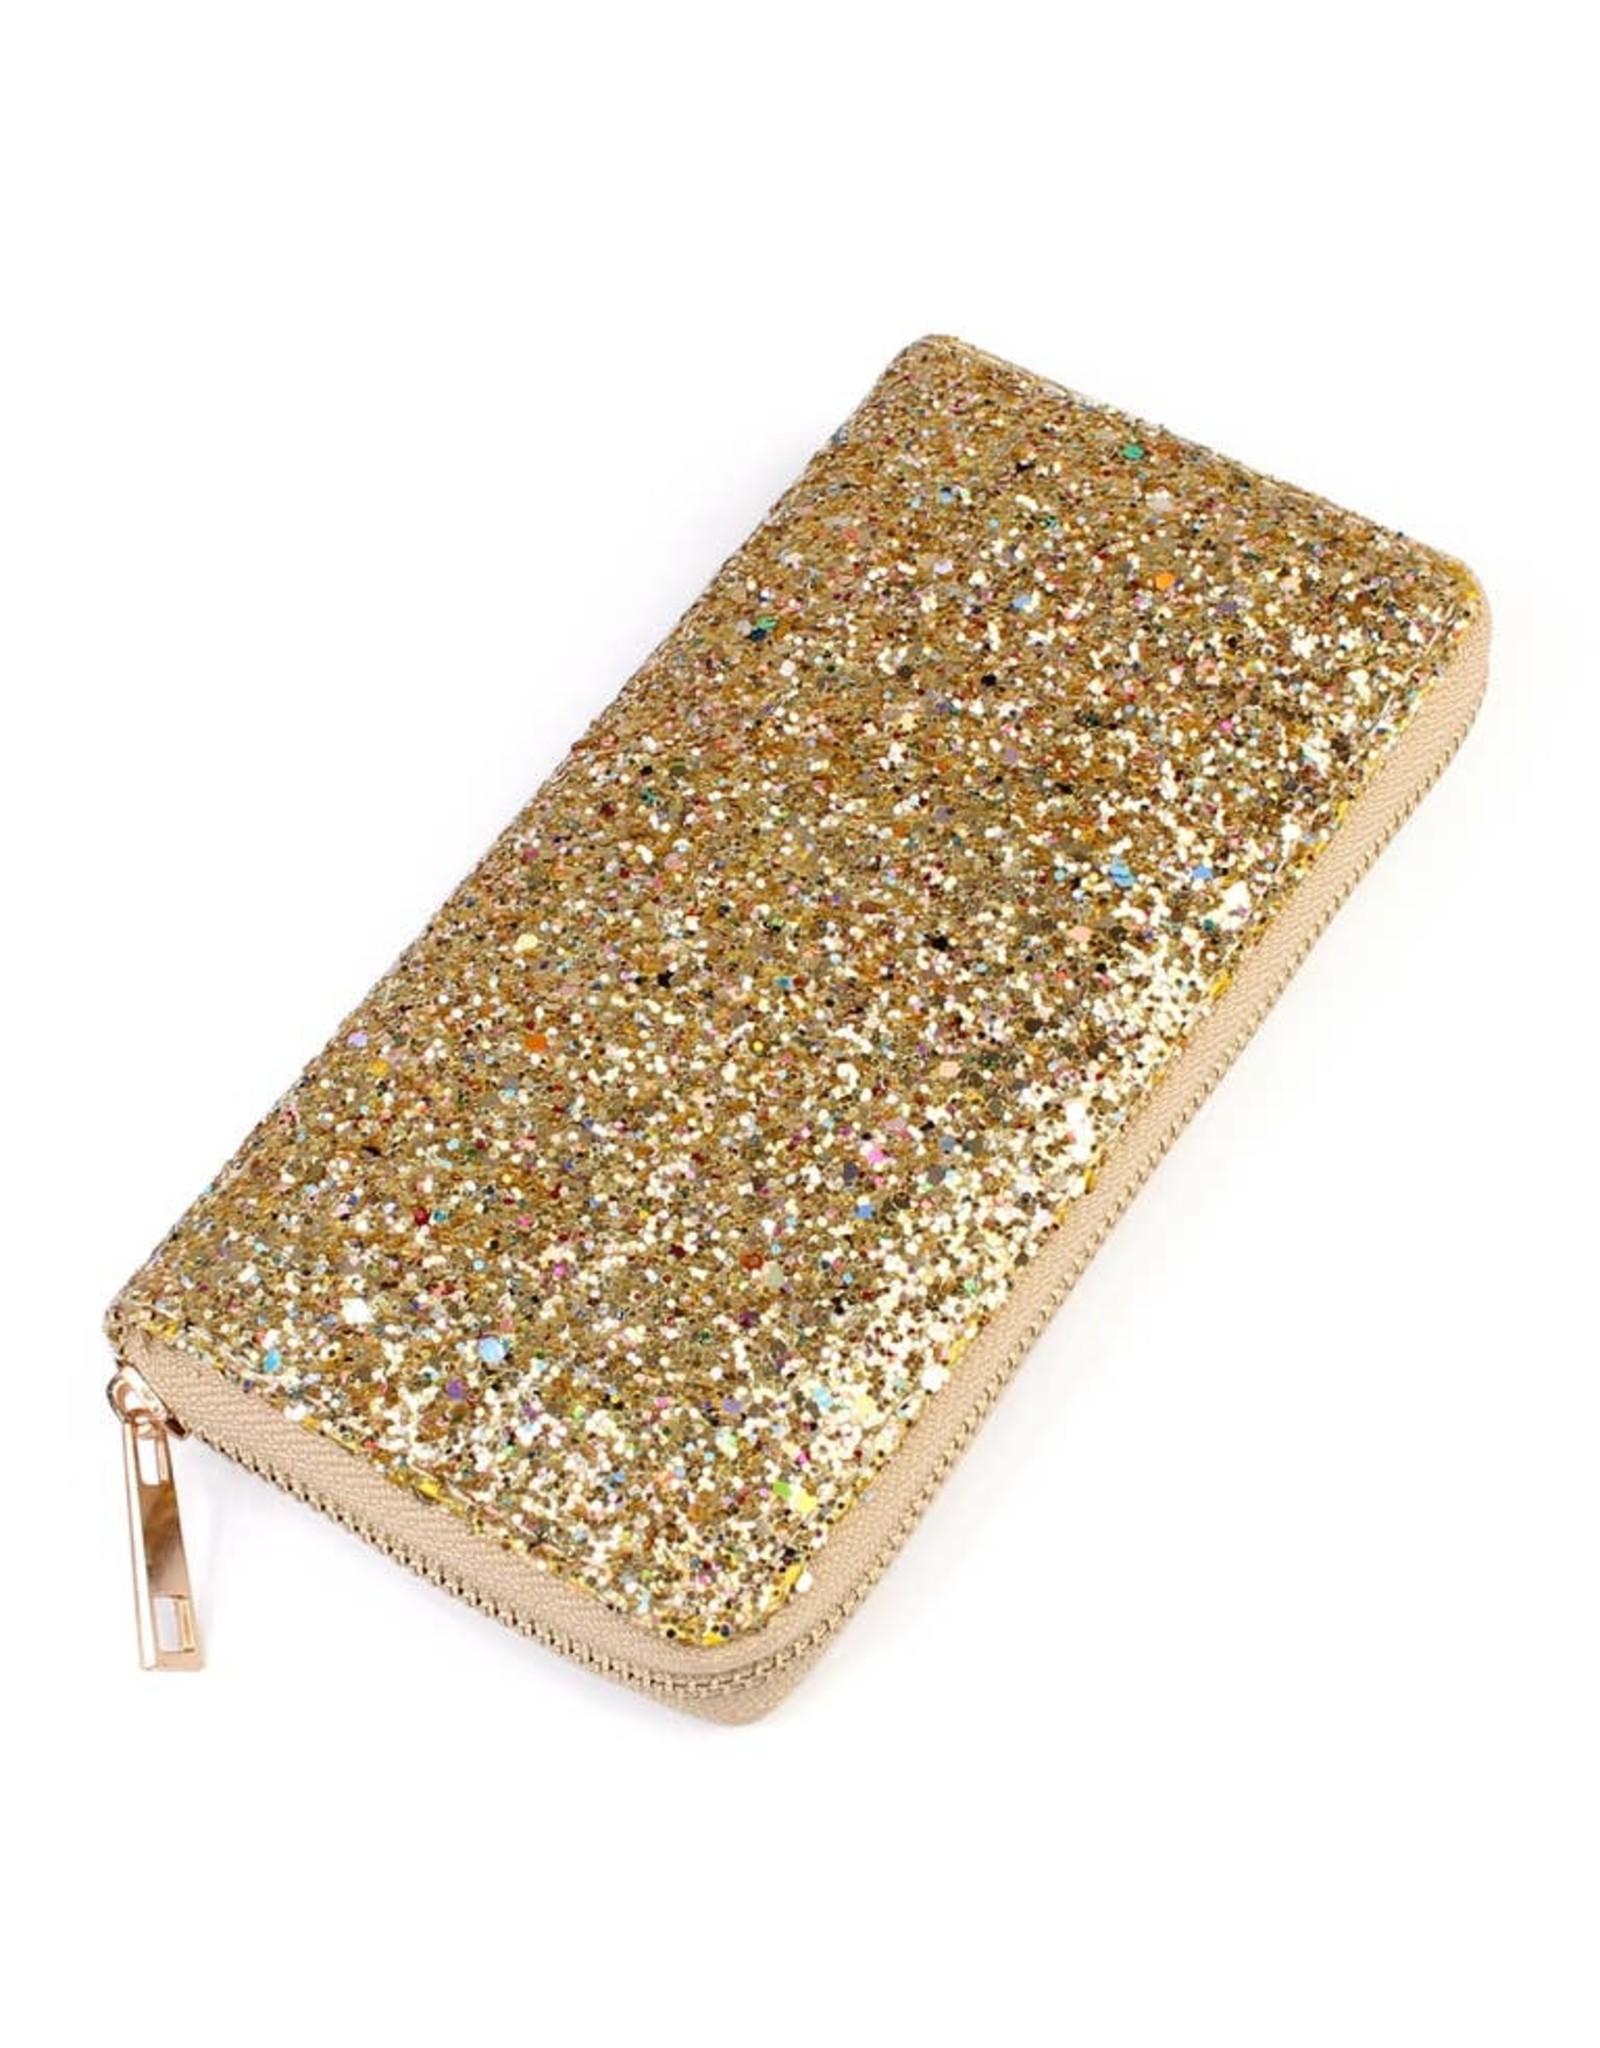 MYS Wholesale Wallet- Zipper Gold Glitter